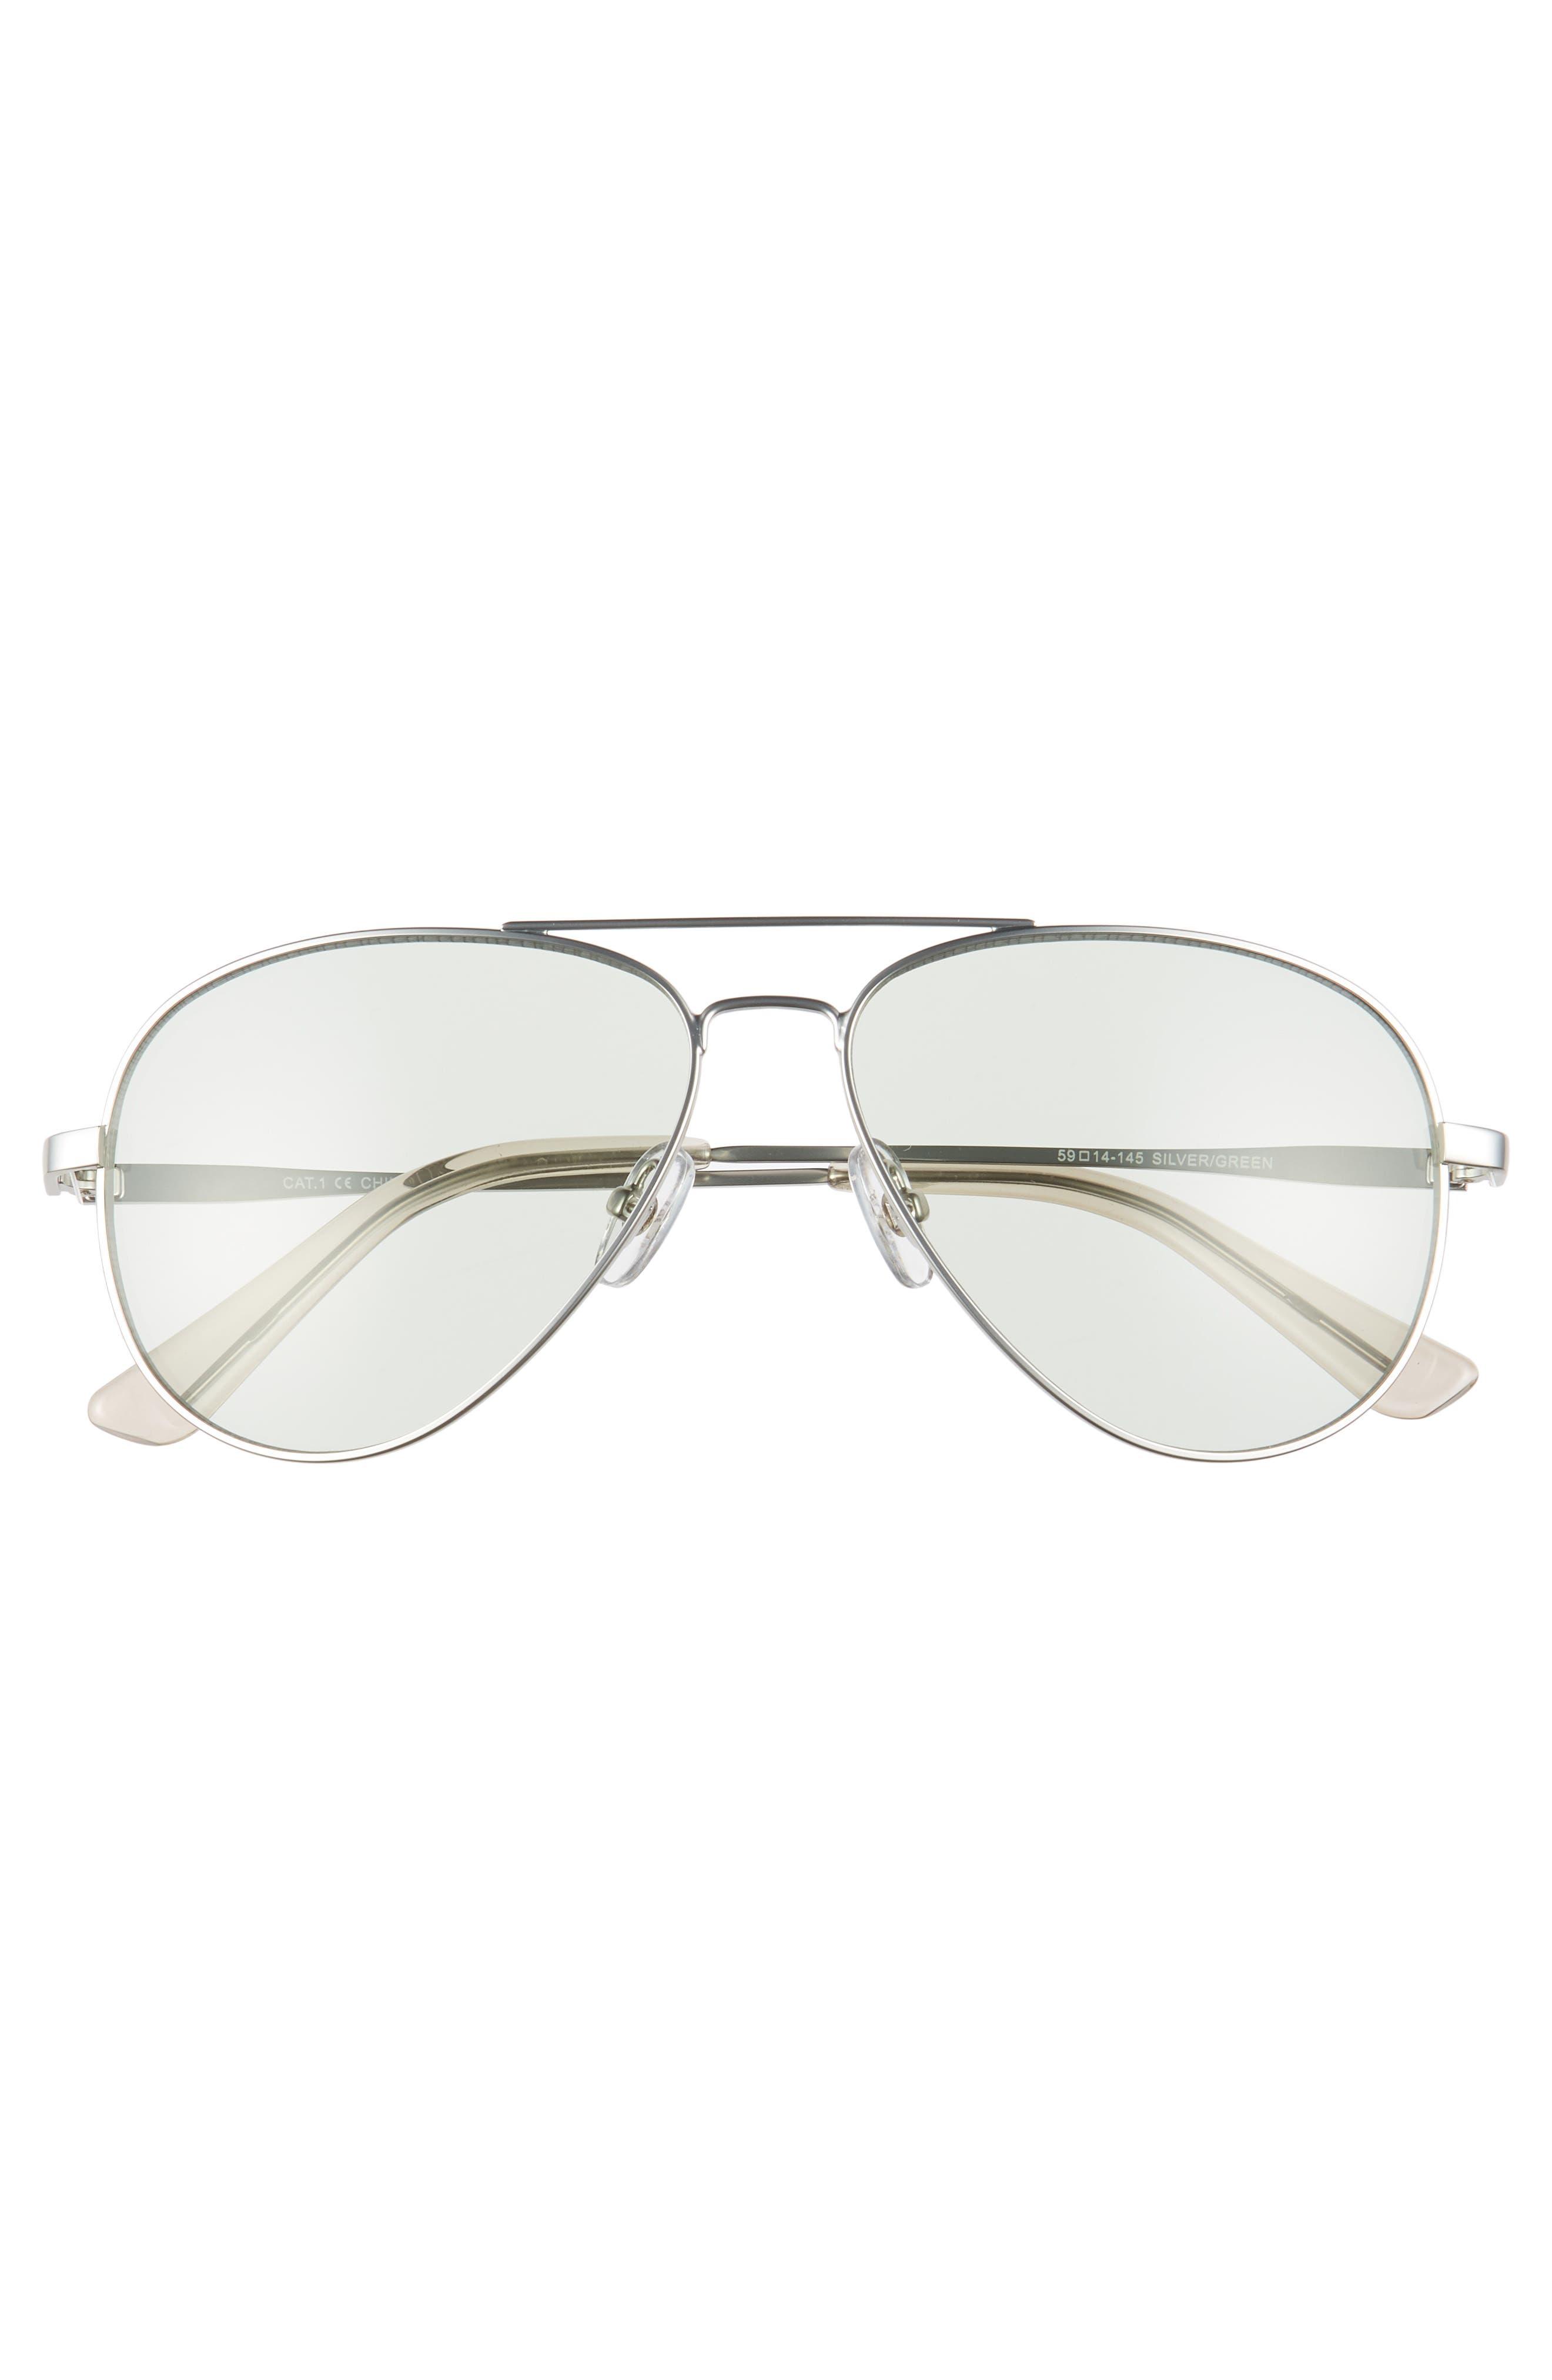 Davis 59mm Aviator Sunglasses,                             Alternate thumbnail 2, color,                             SILVER/ GREEN